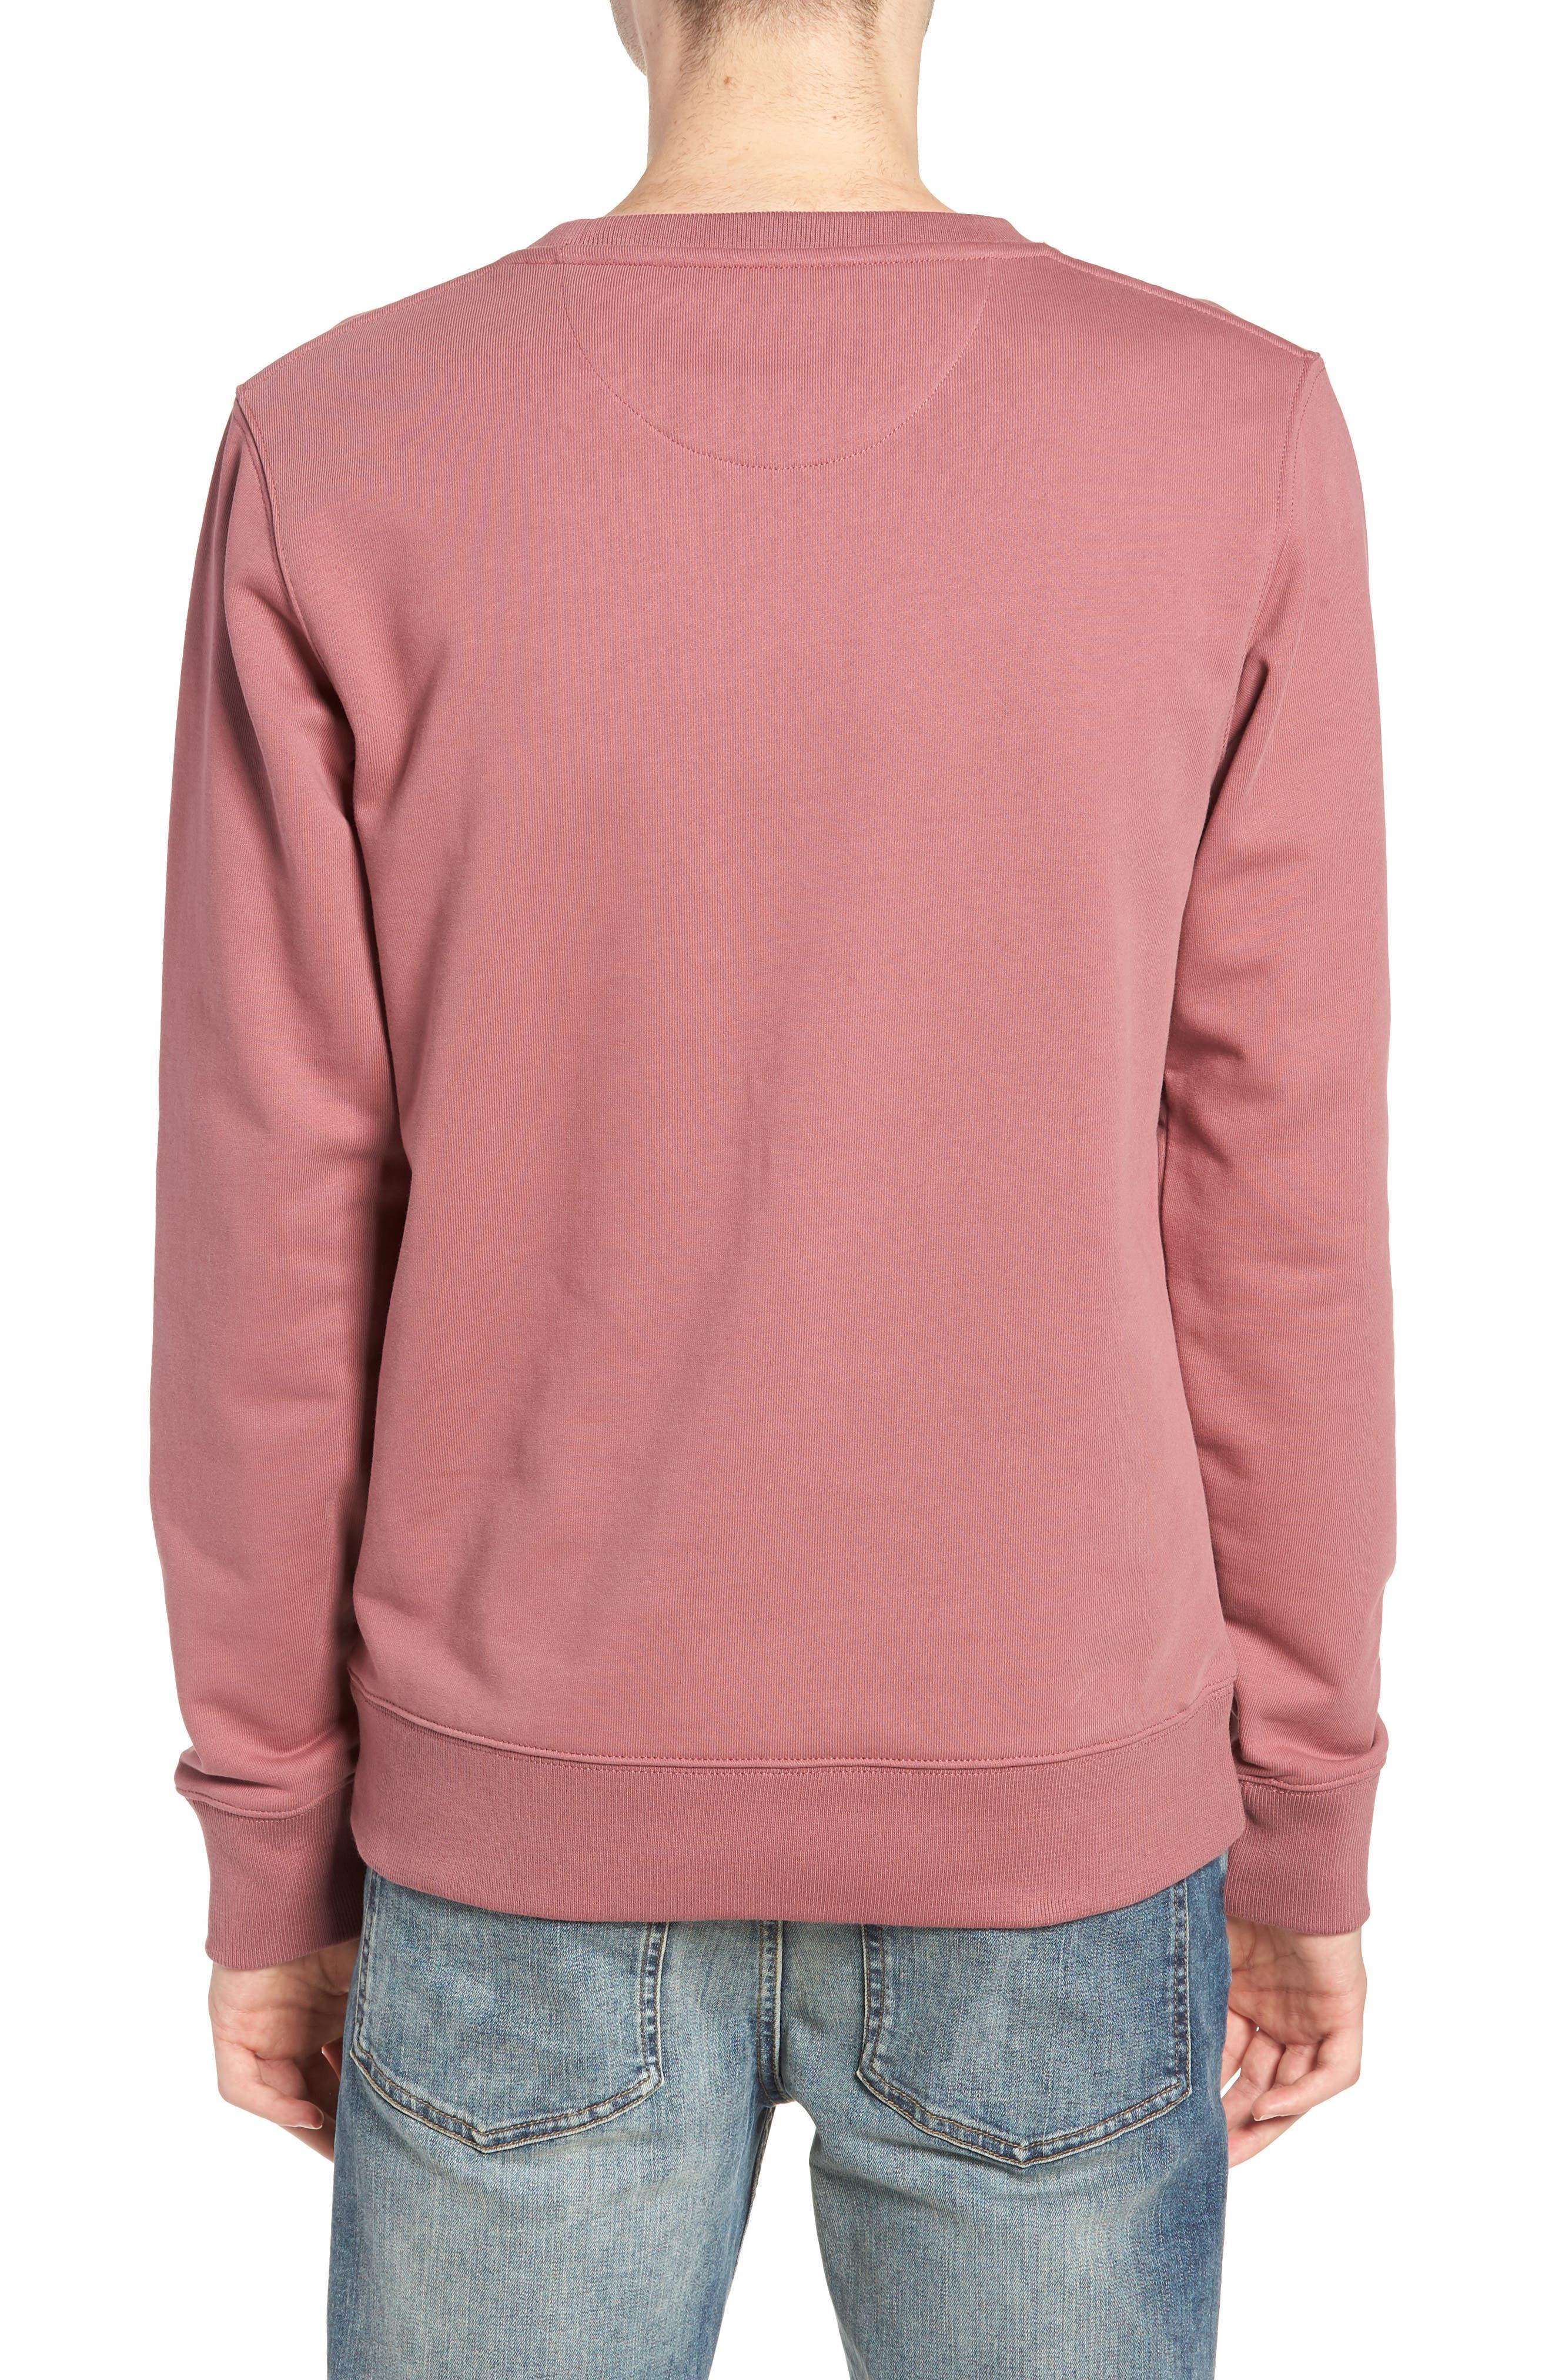 Bowery Sweatshirt,                             Alternate thumbnail 2, color,                             650